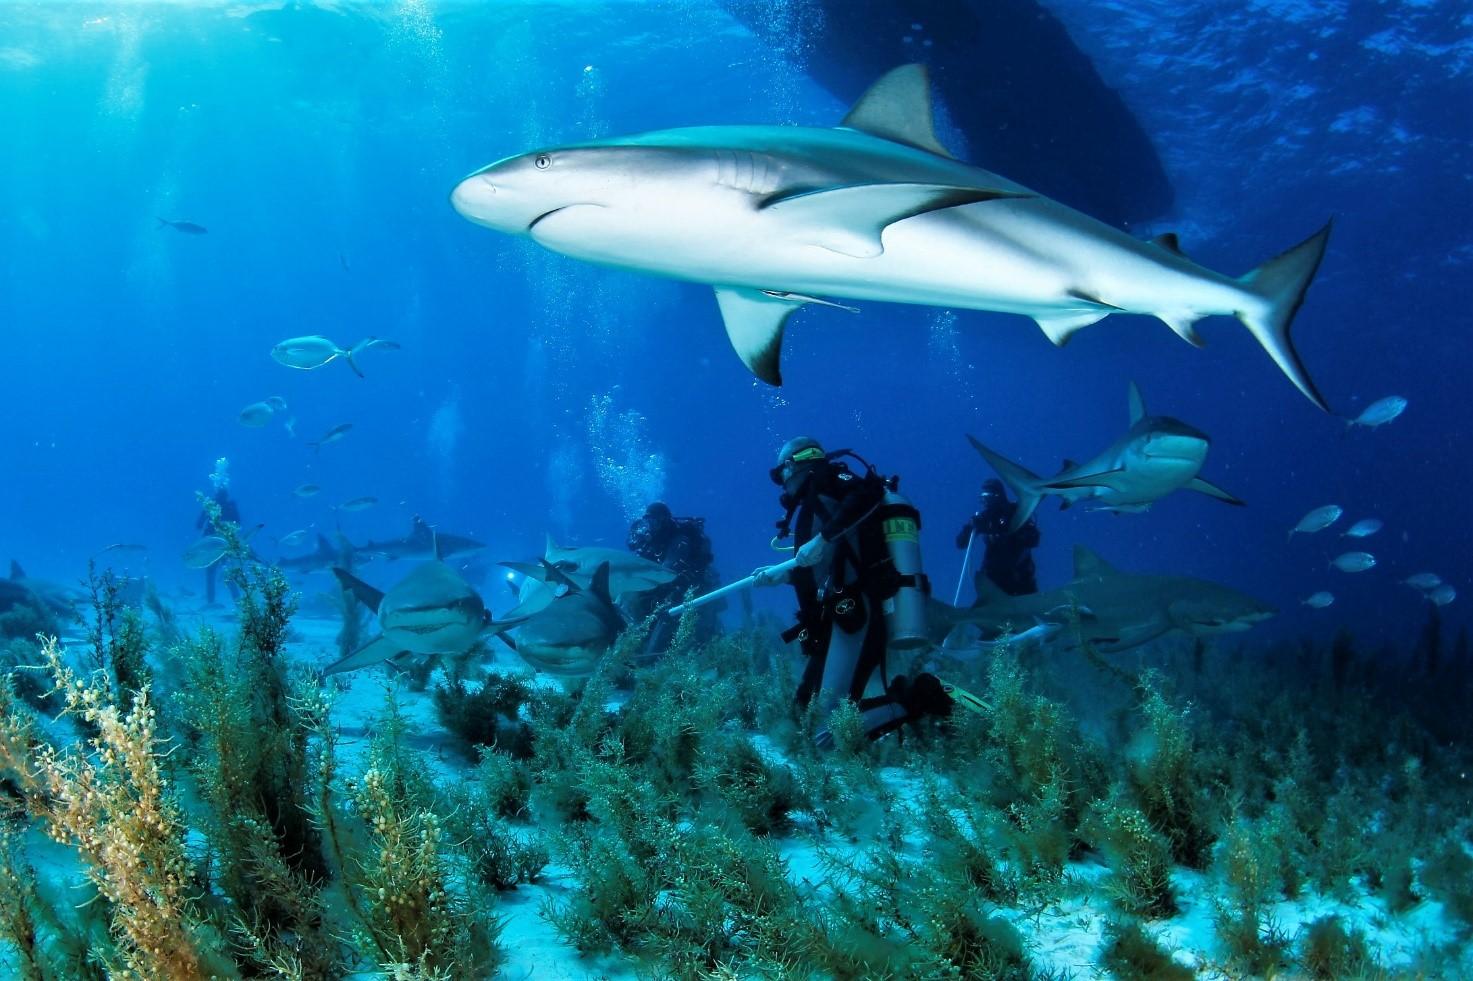 Rekiny żółte osaczają nurka